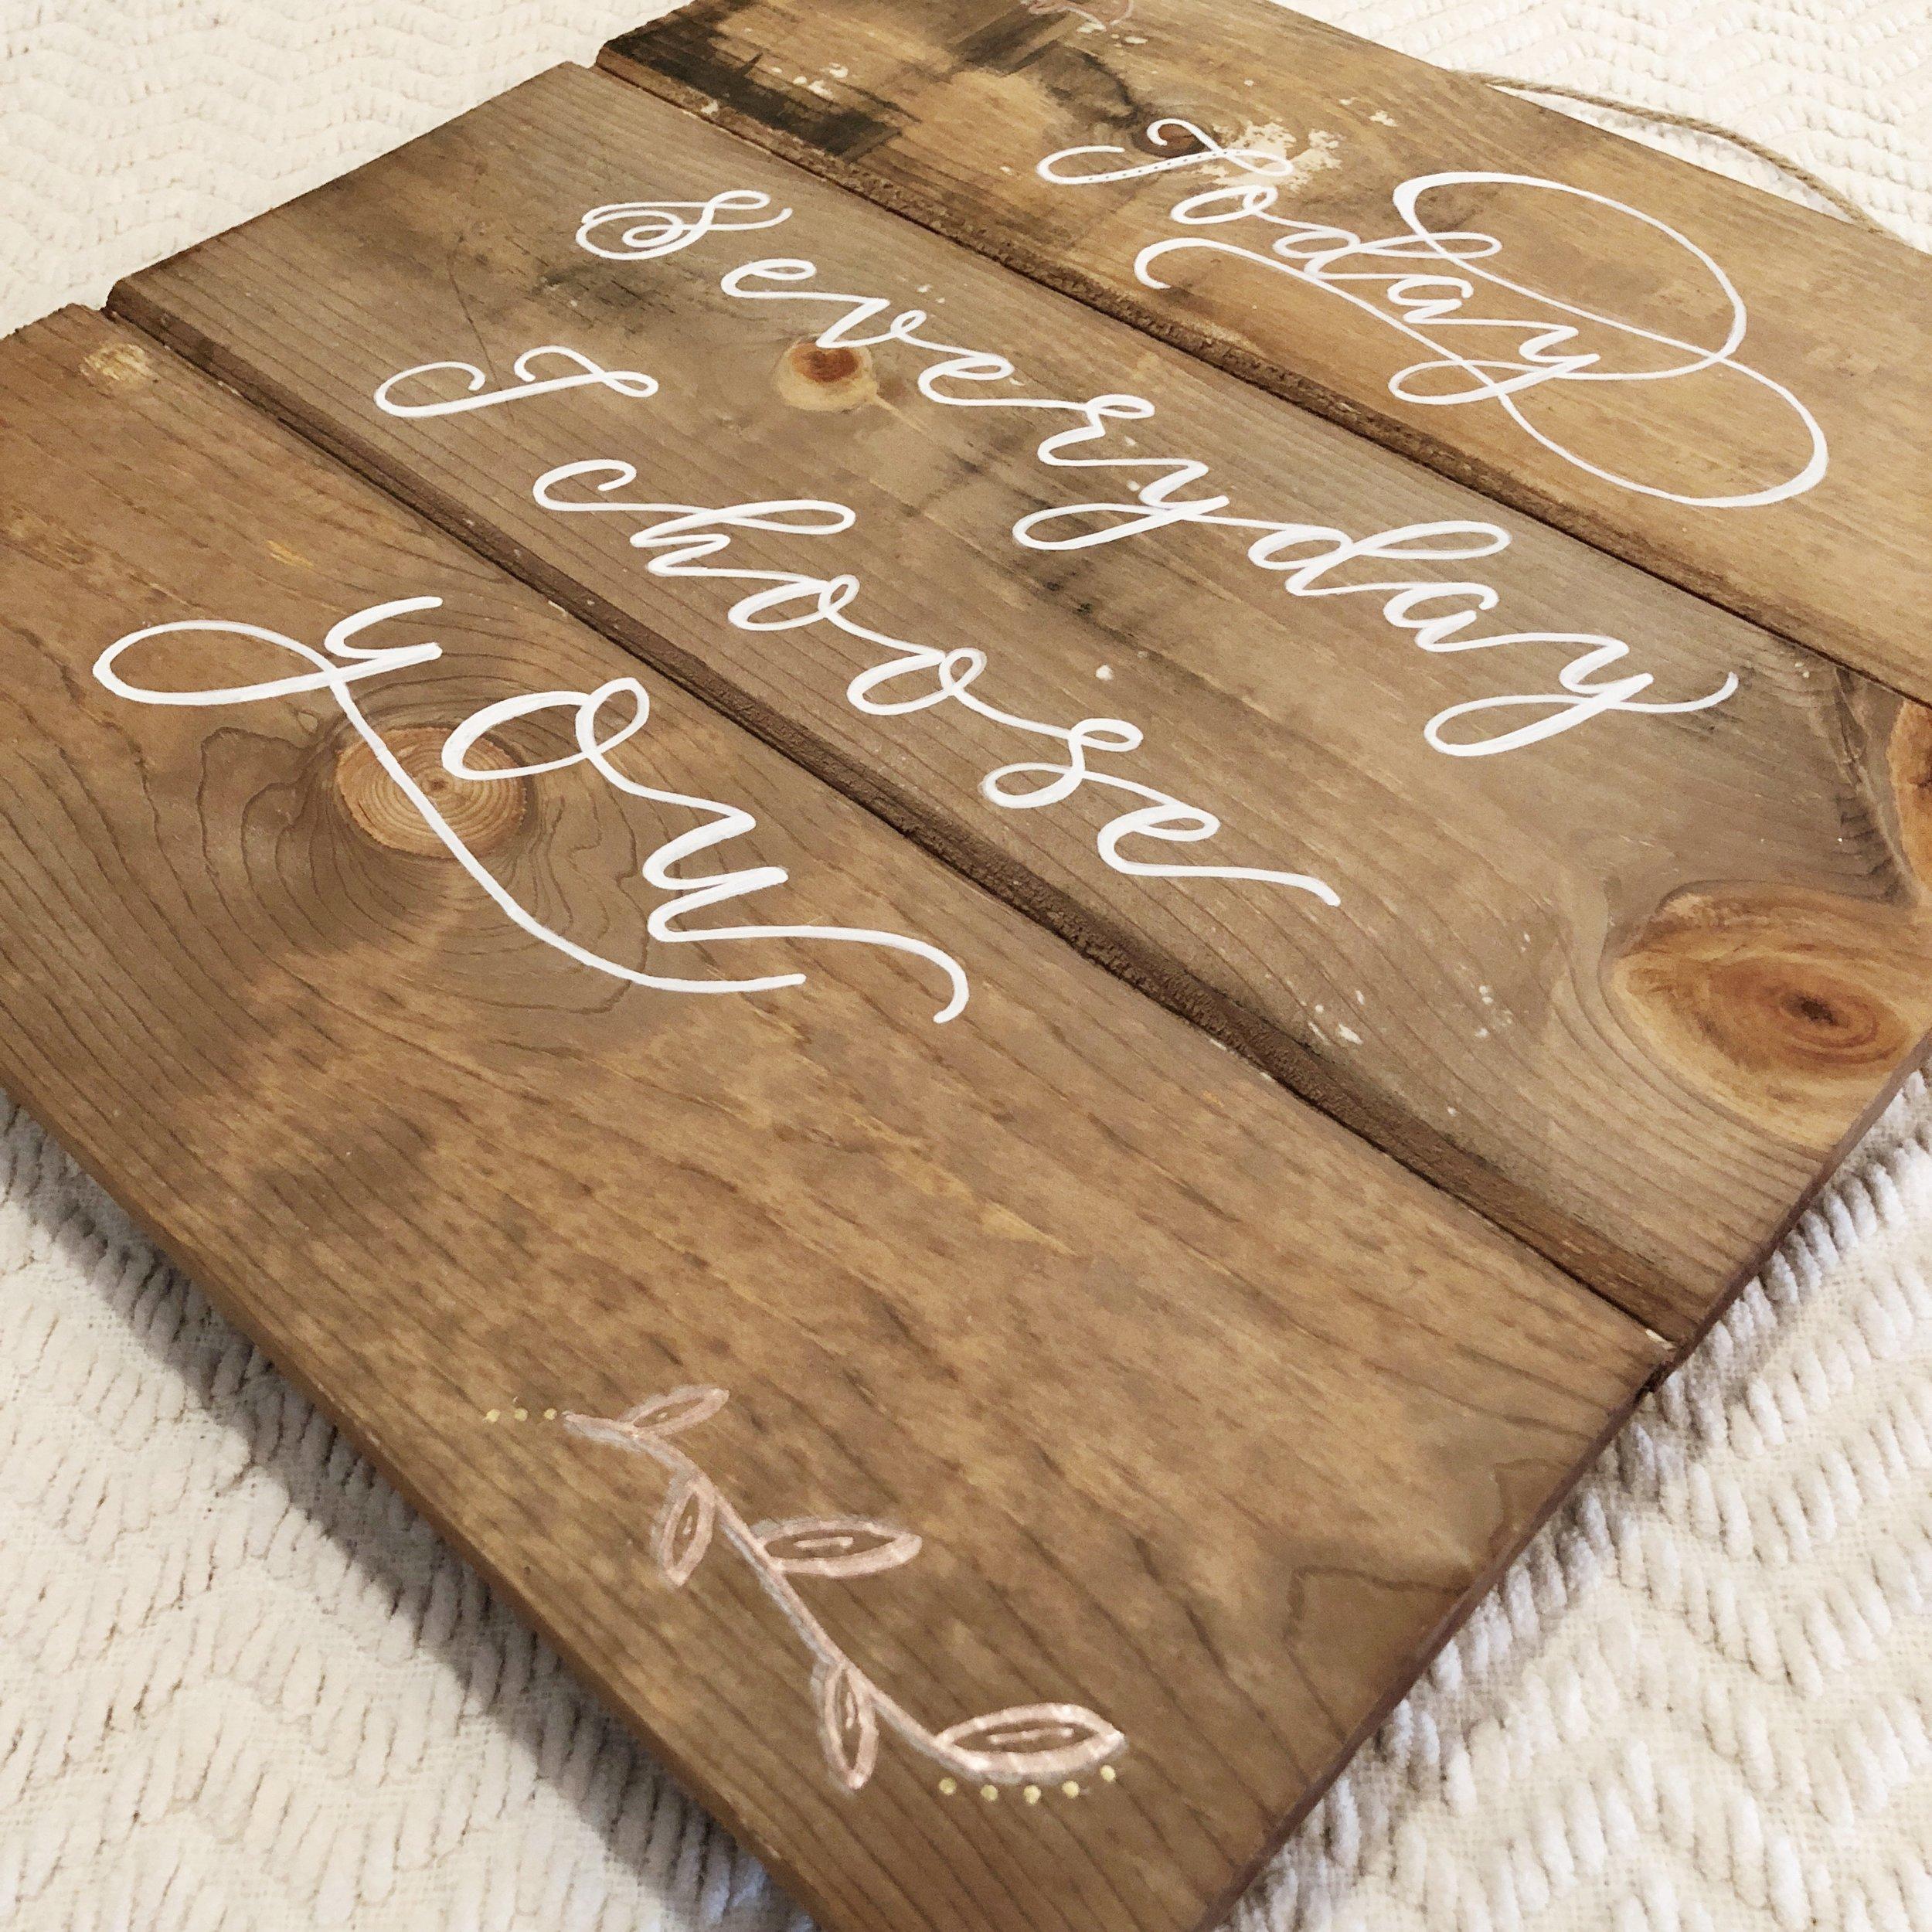 Central PA, York PA, JesSmith Designs, custom, wedding, invitations, bridal, announcements, save the date, baby, hanover, calligraphy, baltimore, wedding invitations, lancaster, gettysburg-01-02 05.03.11.jpg